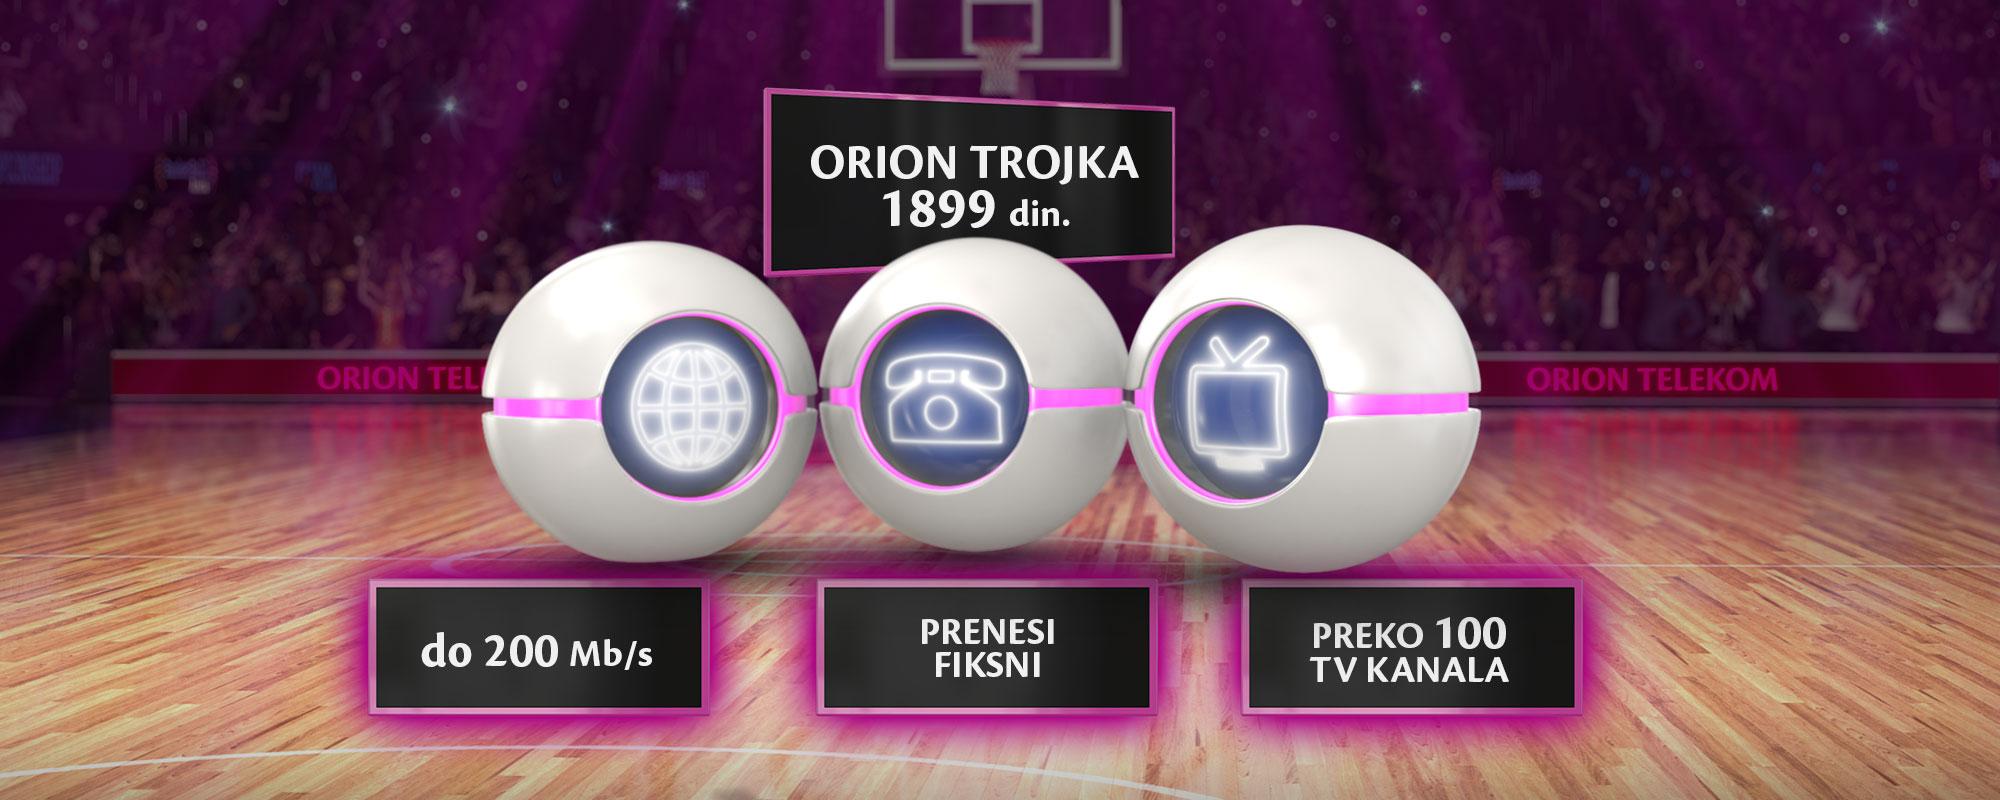 orion-trojka